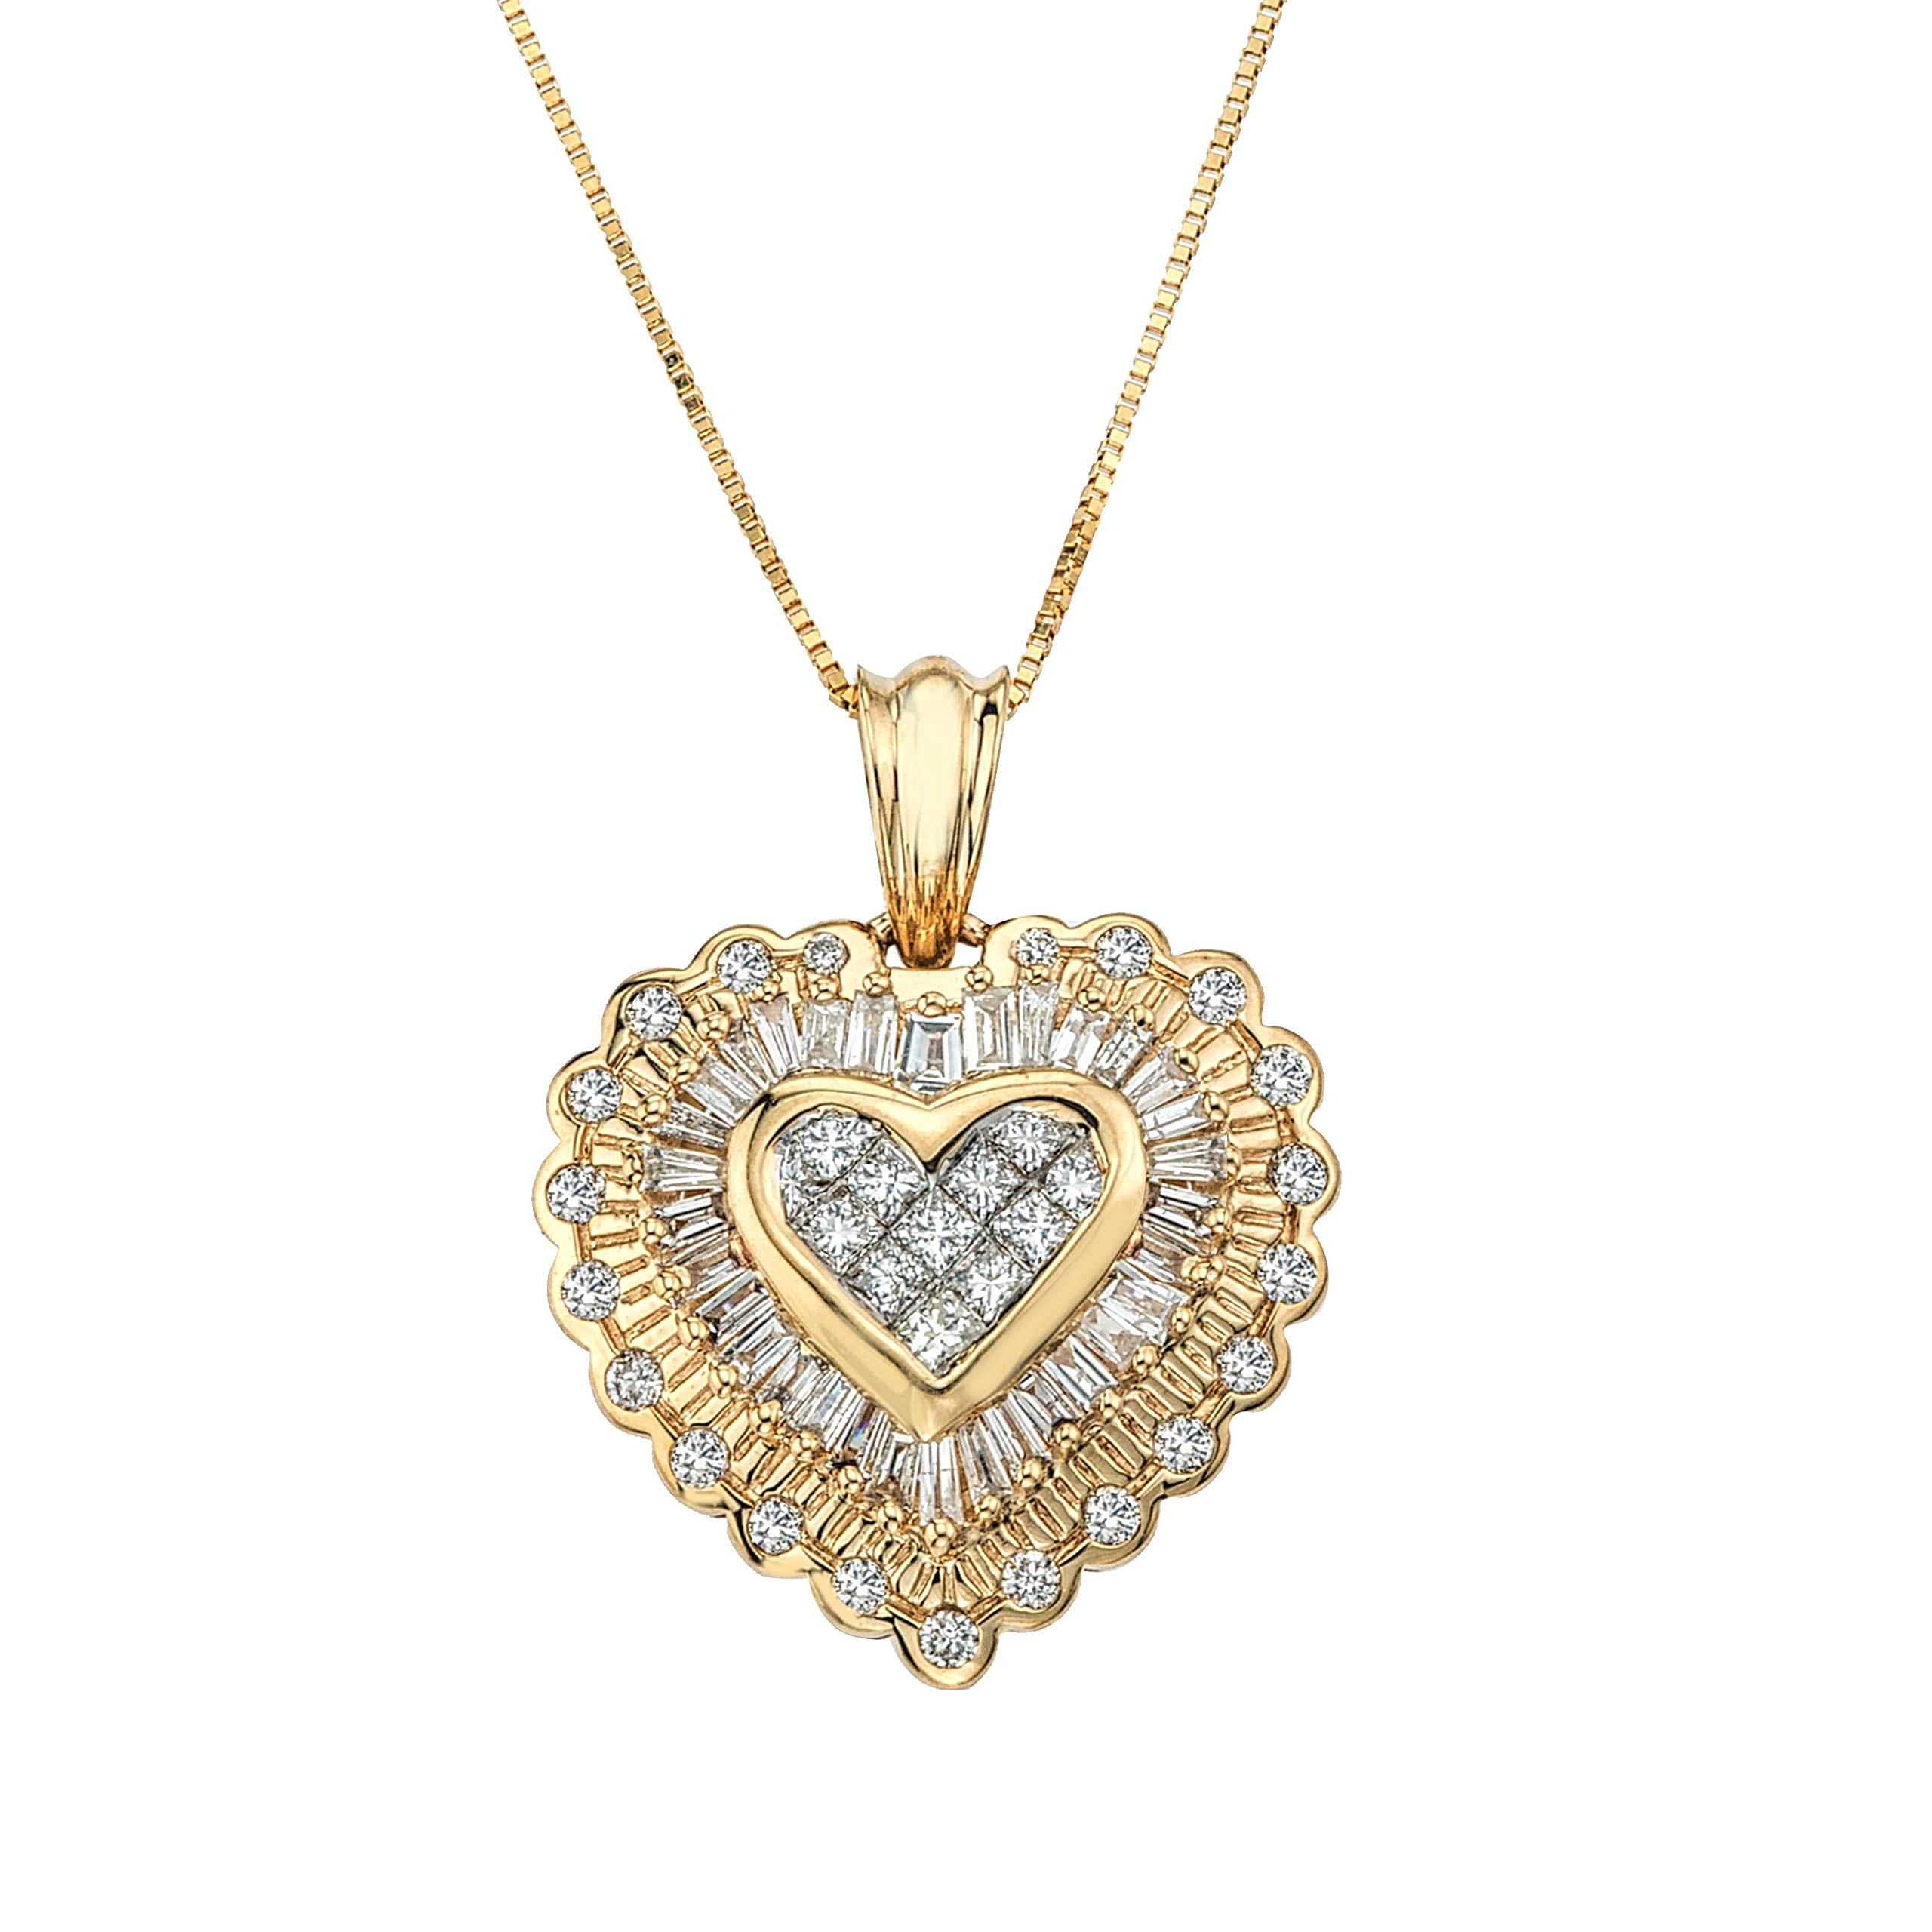 1ct Diamond Heart Pendant in 14K Yellow Gold